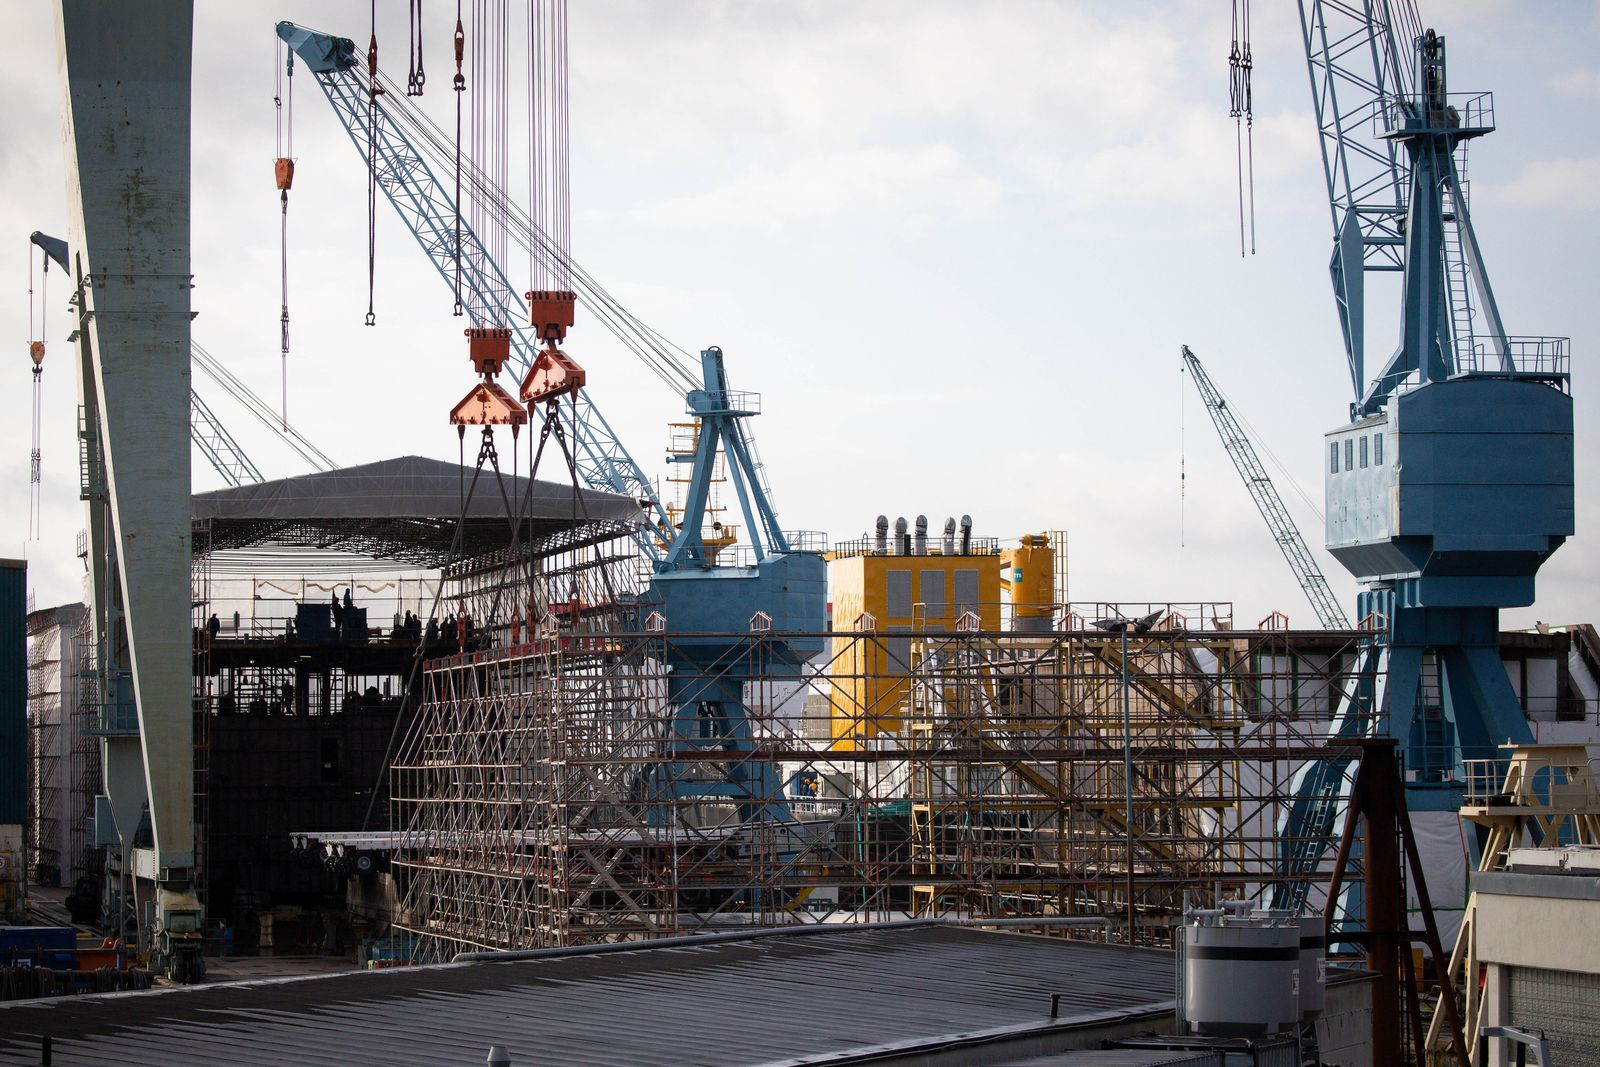 Pella Sietas Werft in Hamburg